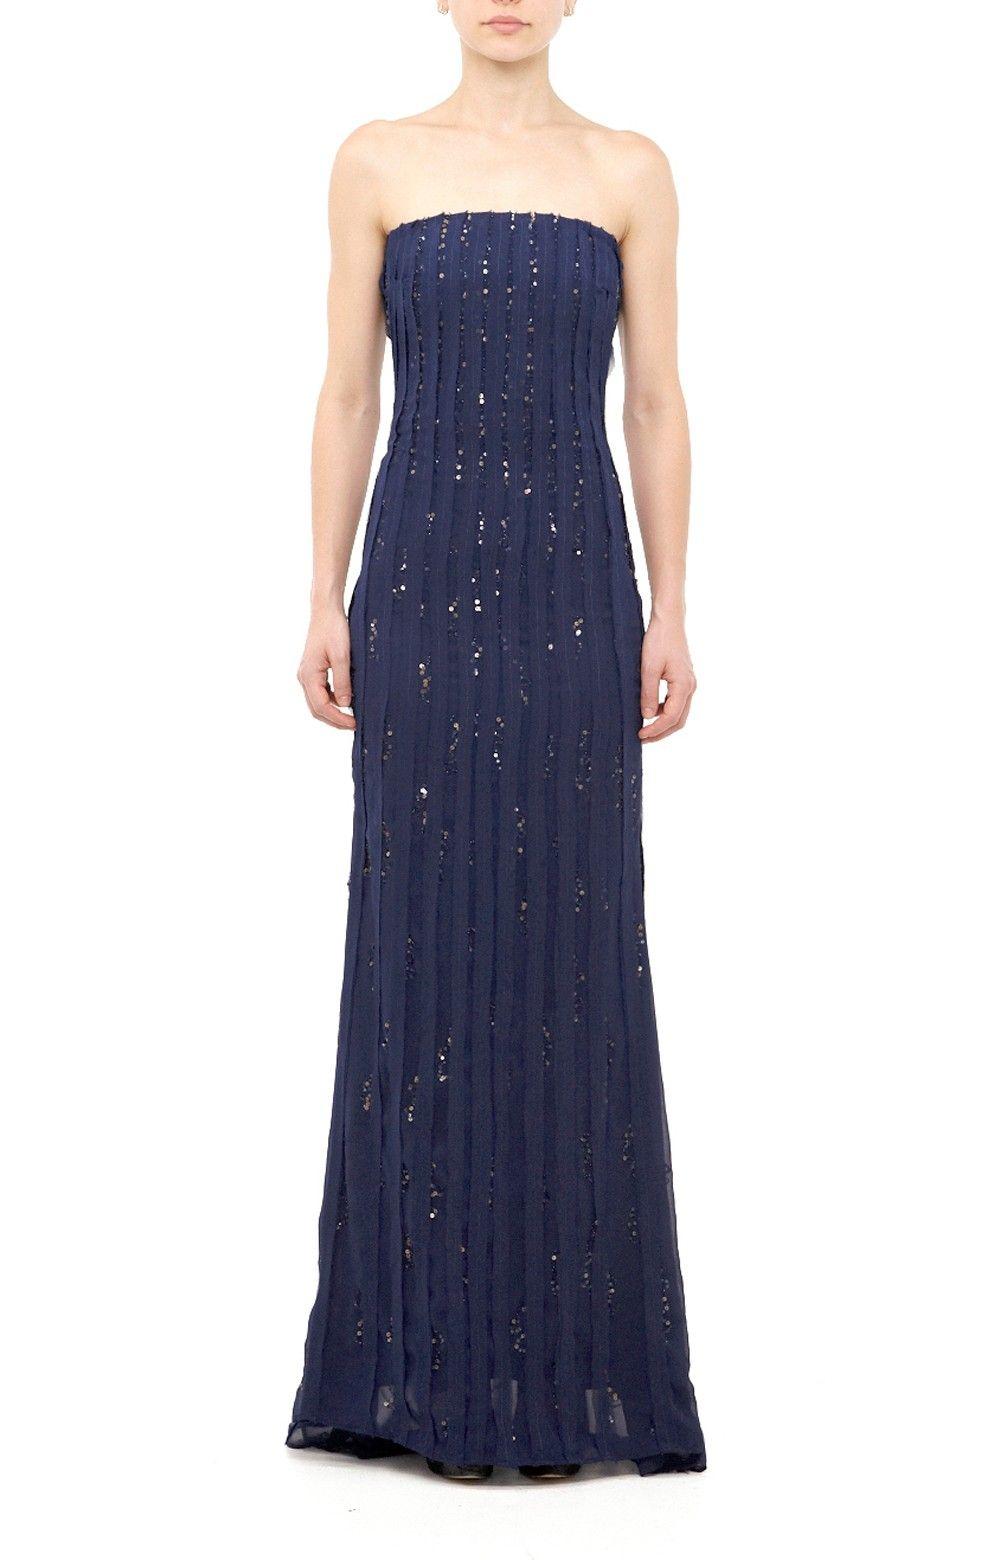 Bellini Sequins Gown - Sequins - Dresses